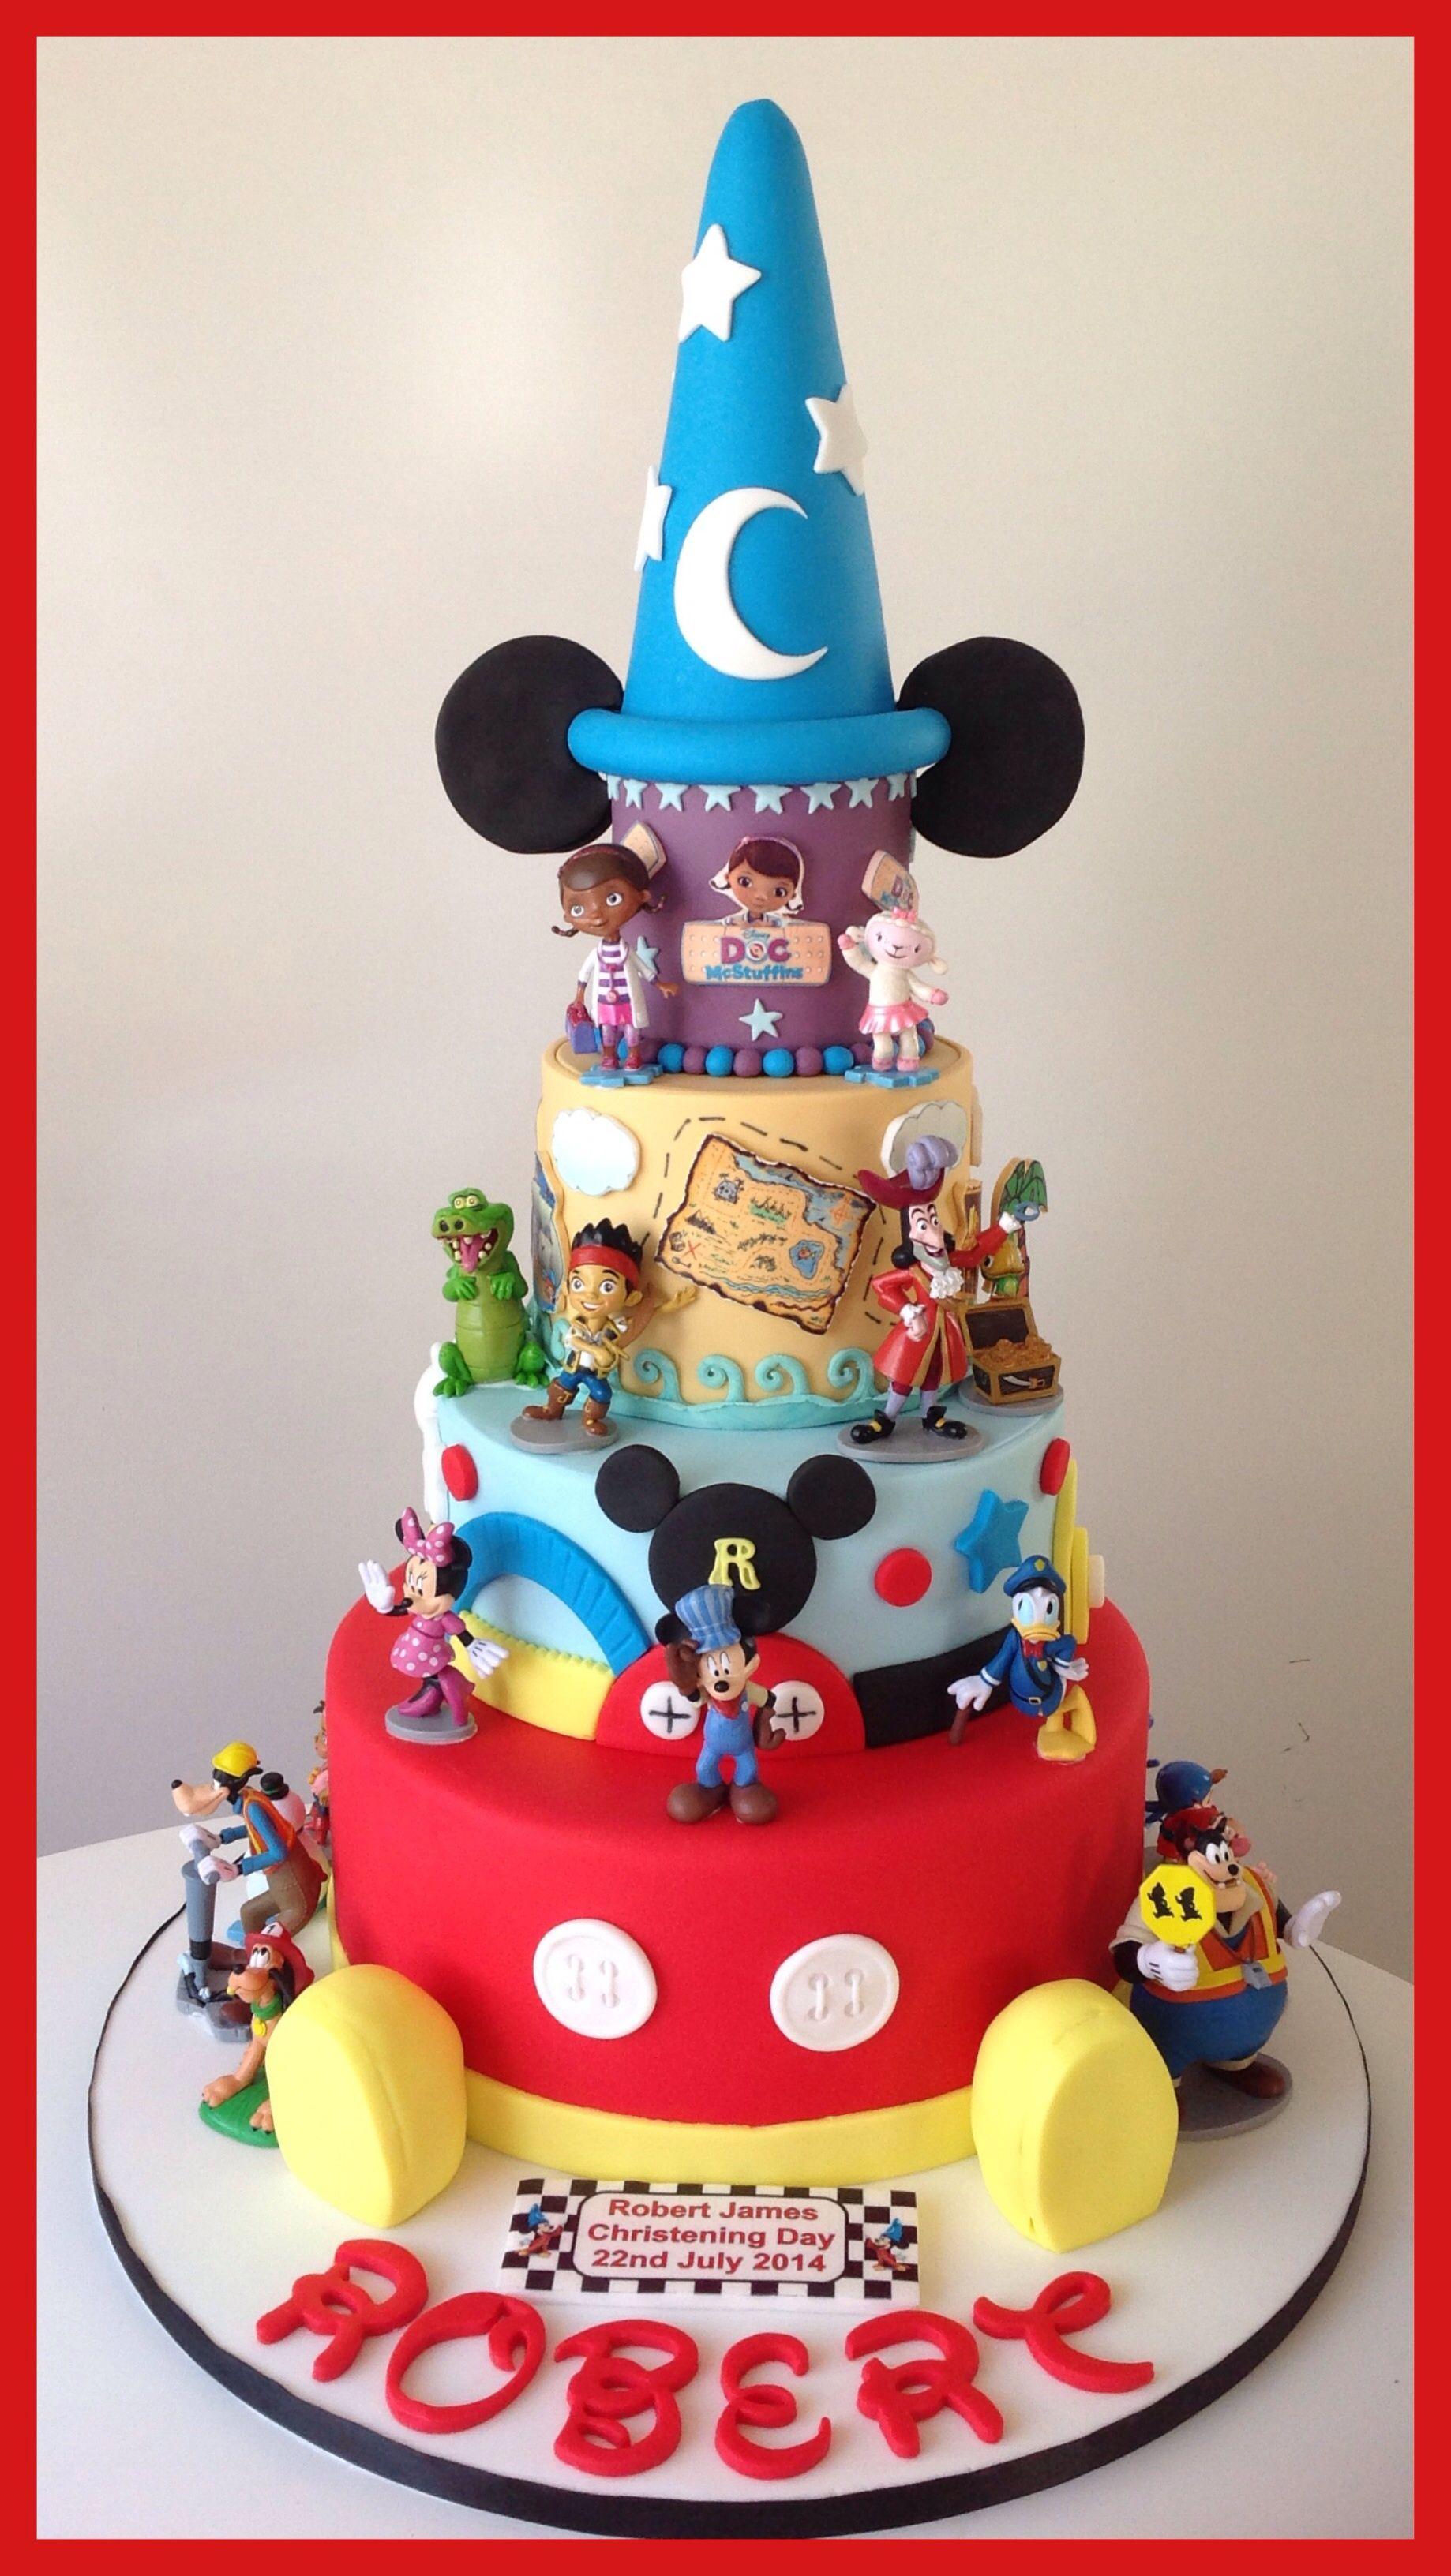 My Grandson's Disney Christening Cake Christening cake